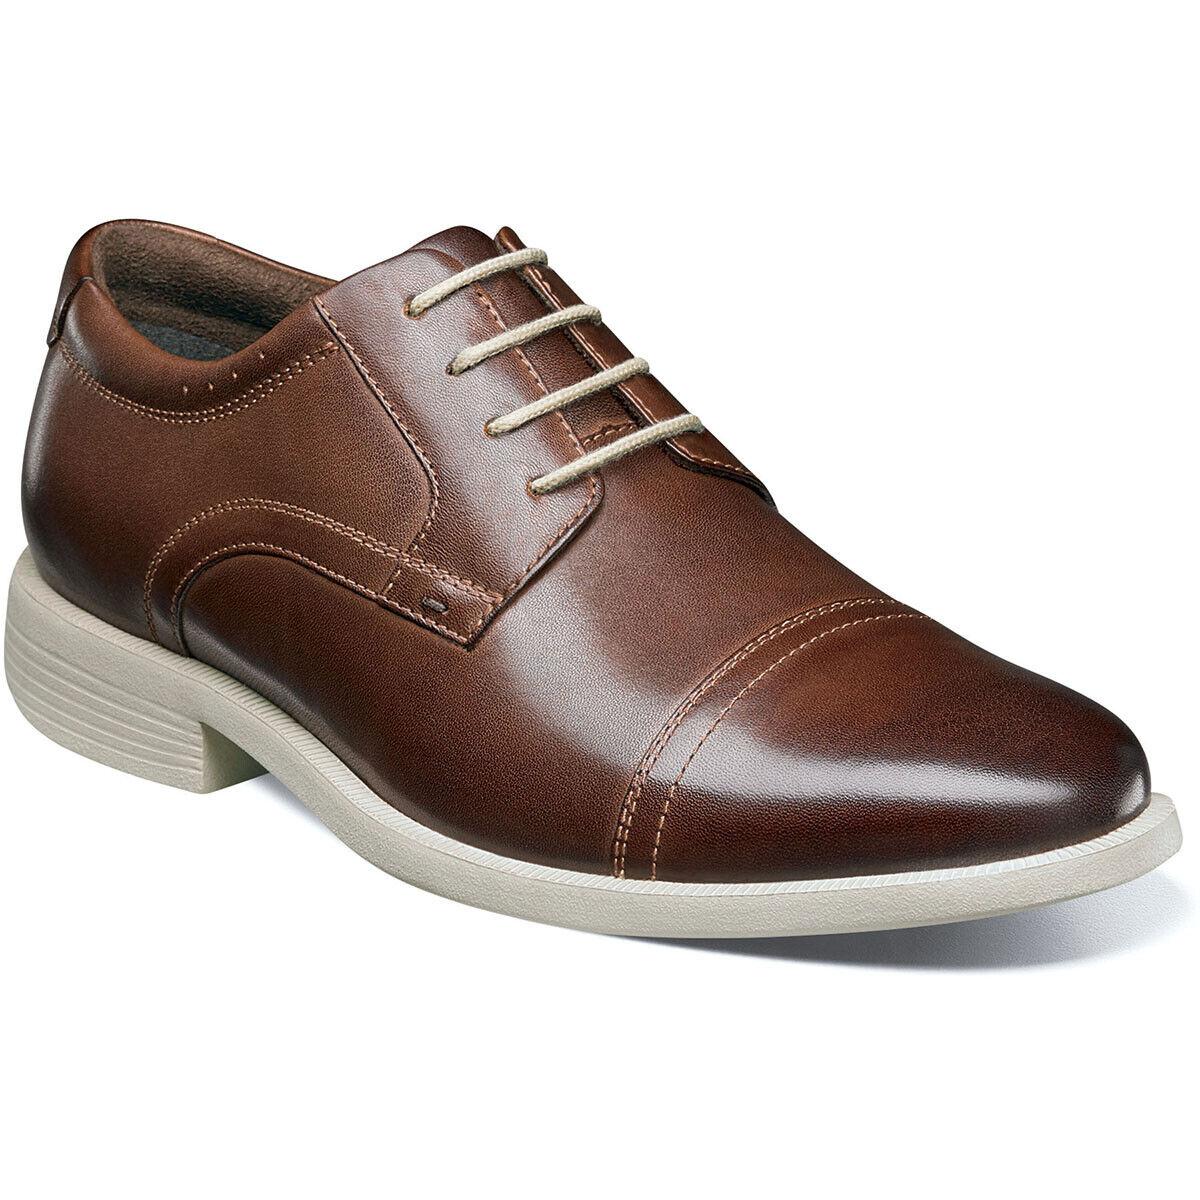 Hommes Chaussures Nunn Bush Dixon Cap Toe Oxford Marron Multi Cuir Confort 84724-249